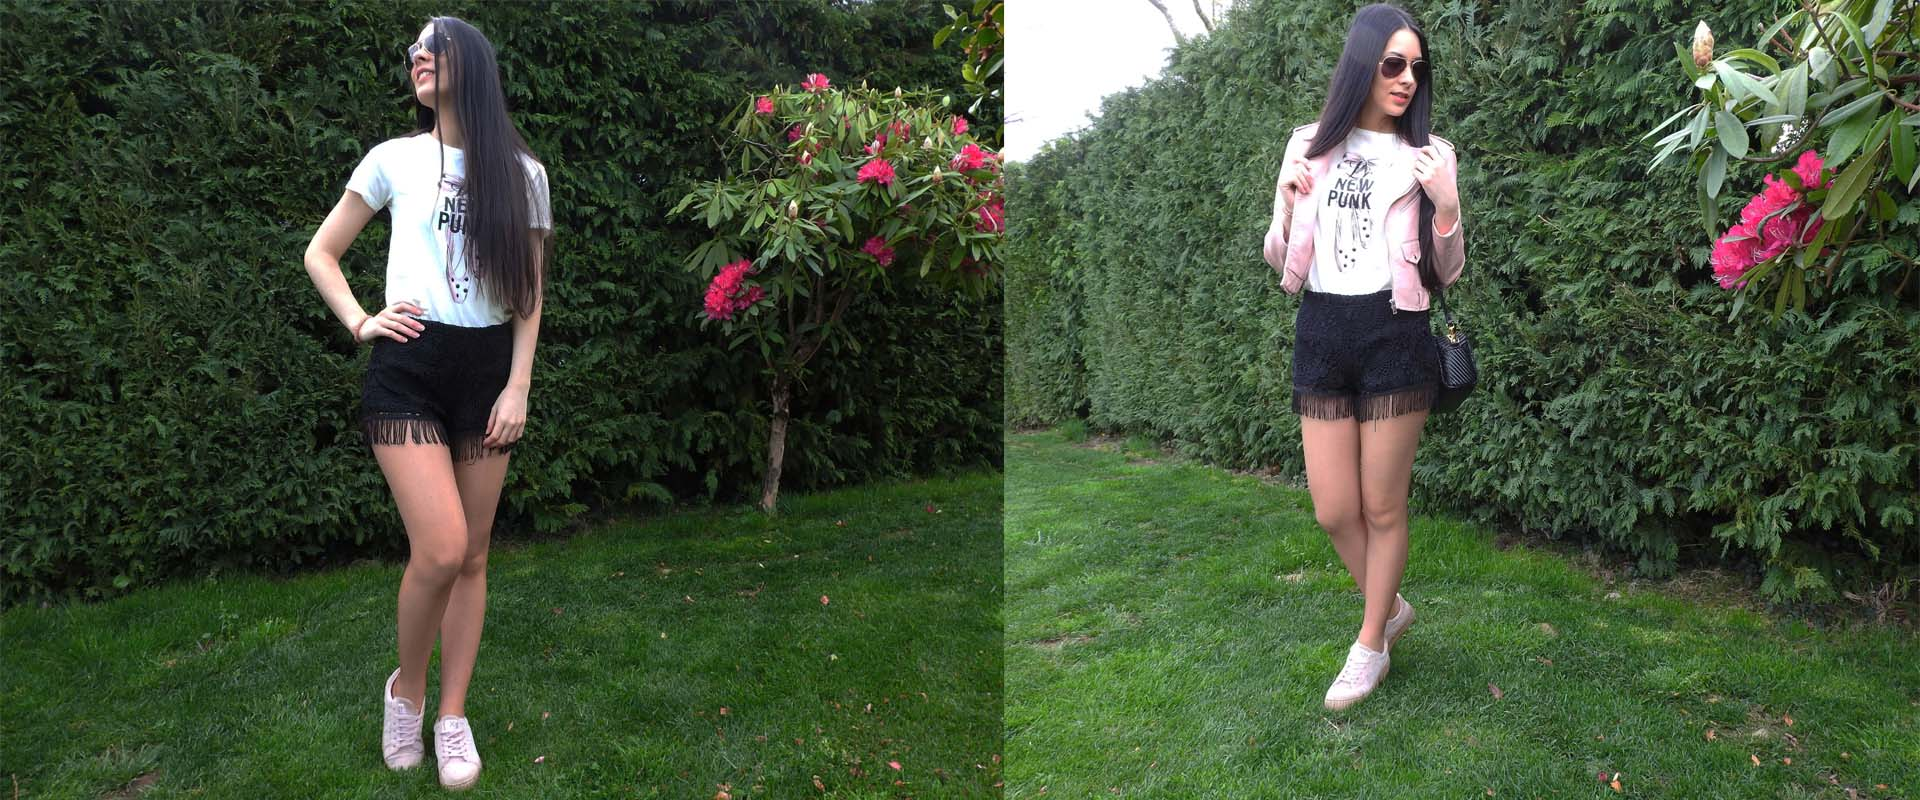 portada shorts flecos1